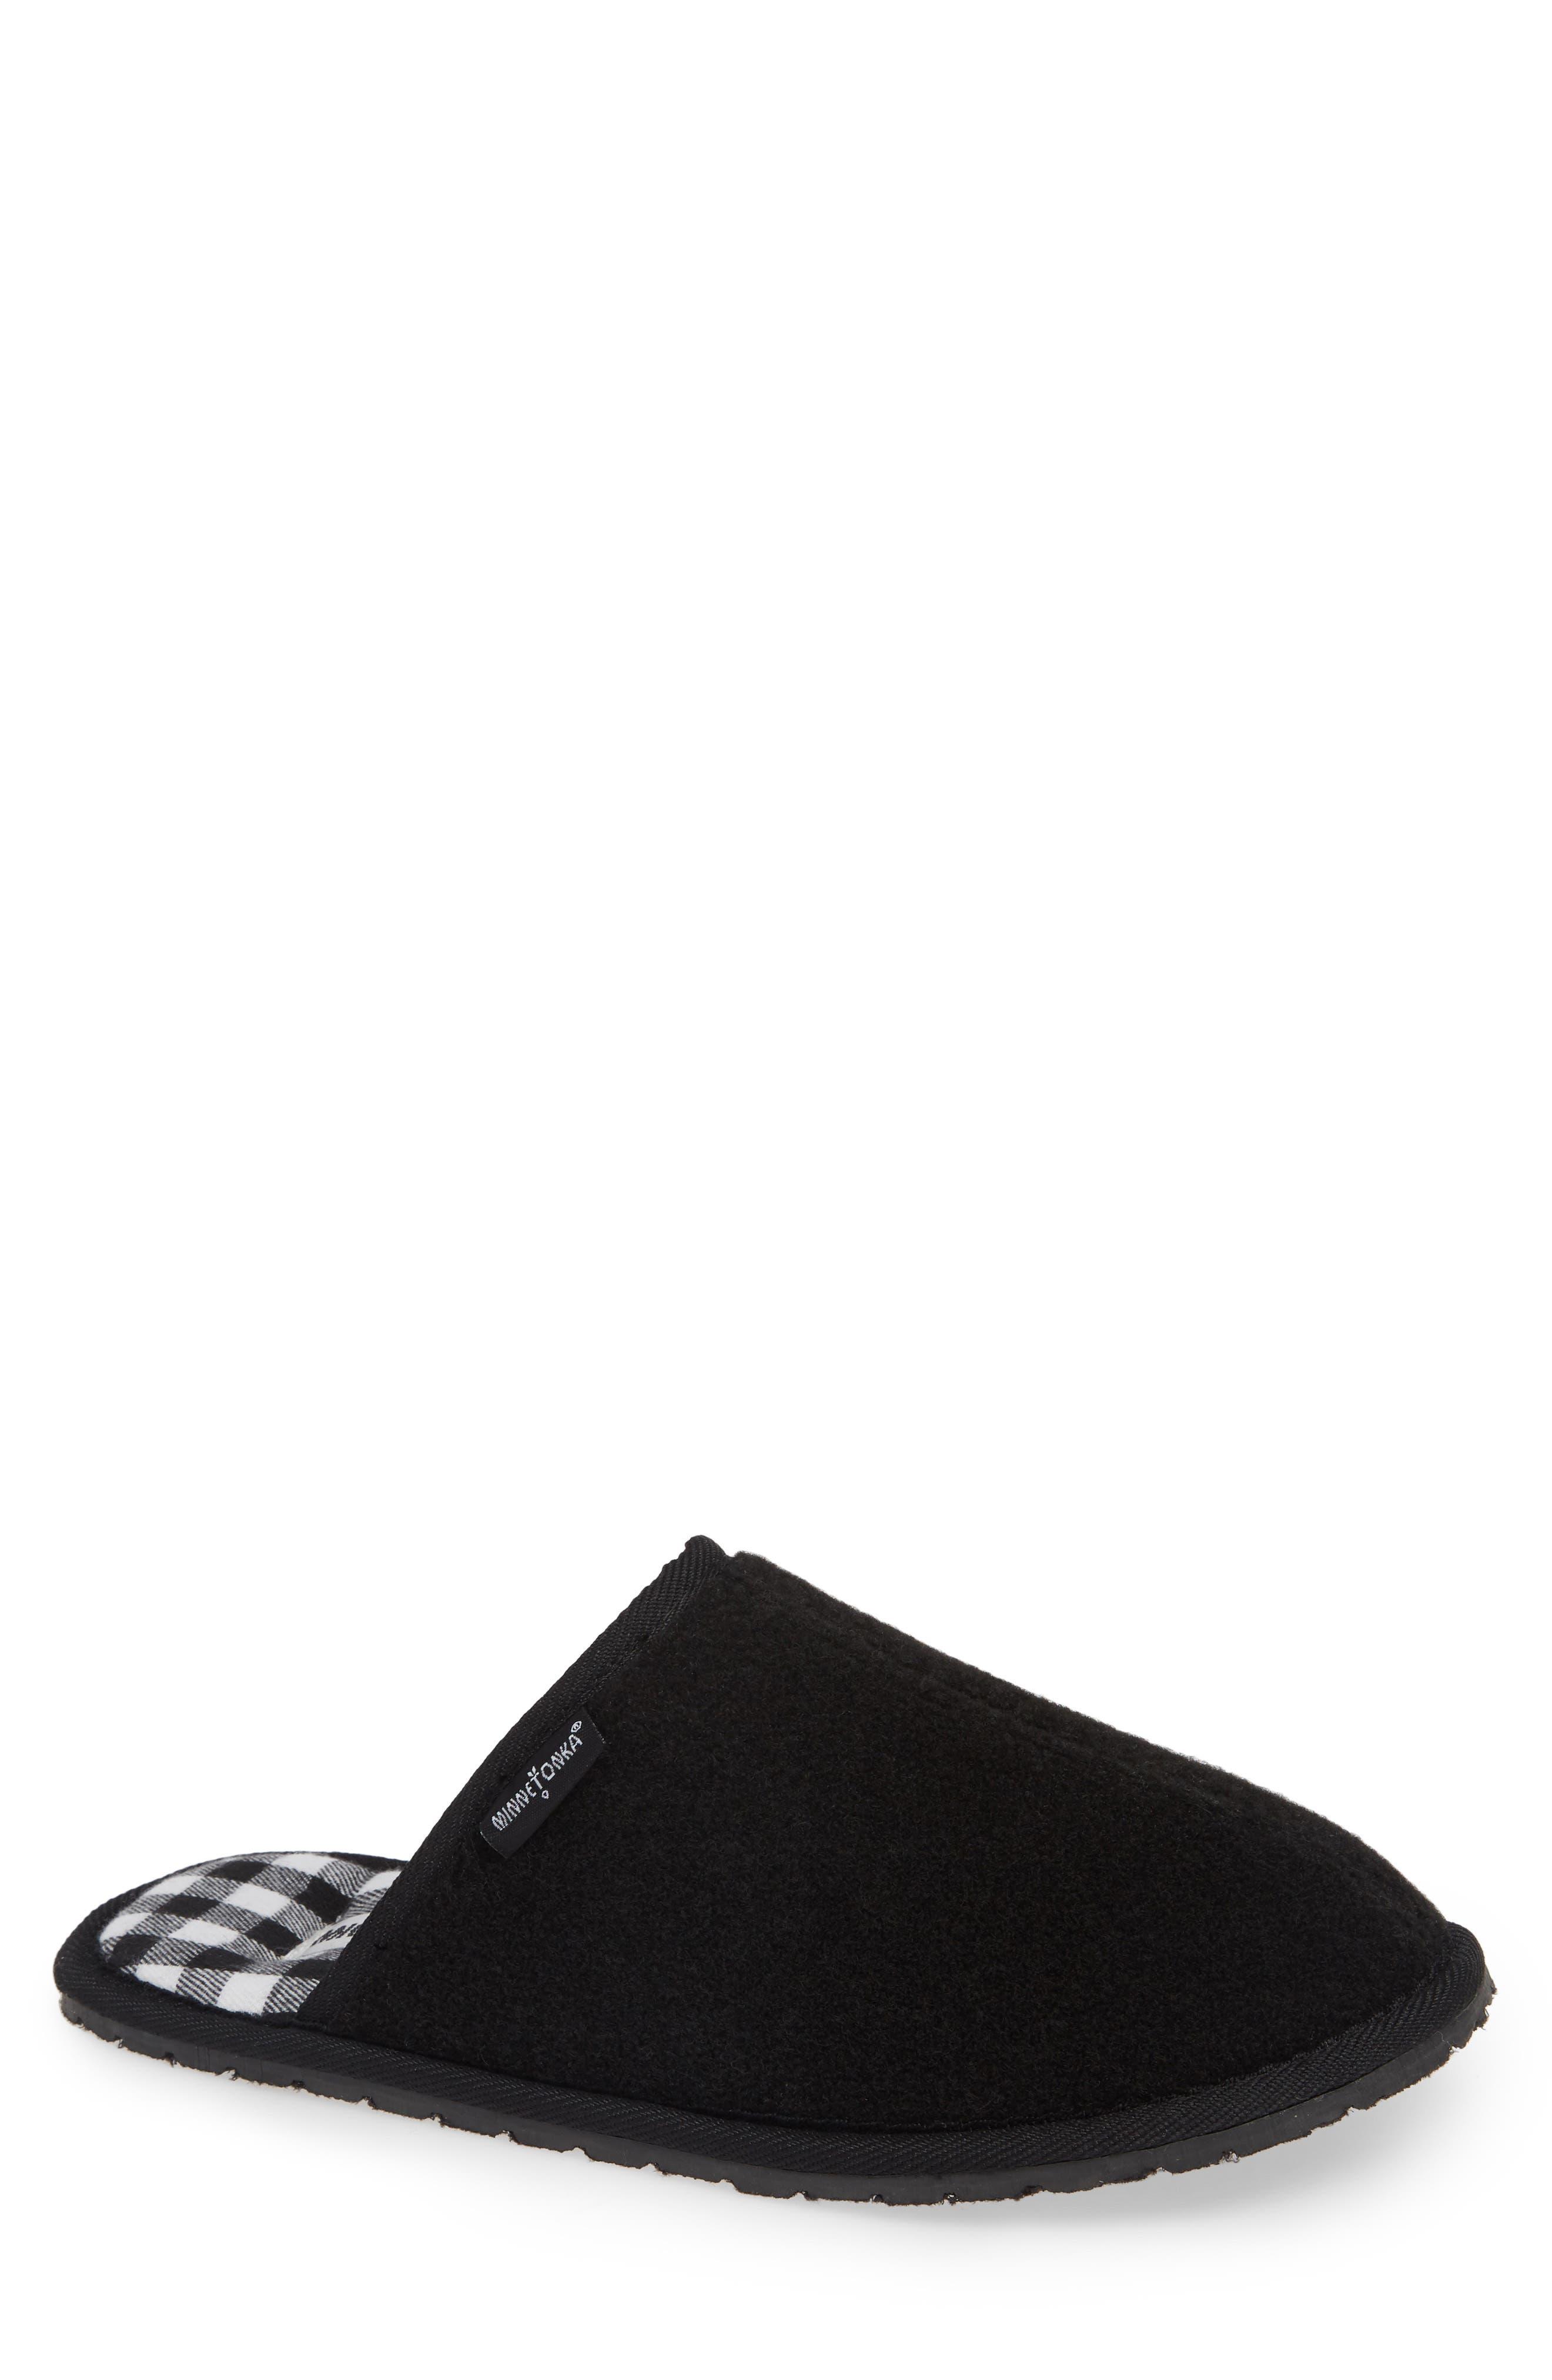 Franklin Scuff Slipper,                             Main thumbnail 1, color,                             BLACK PLAID